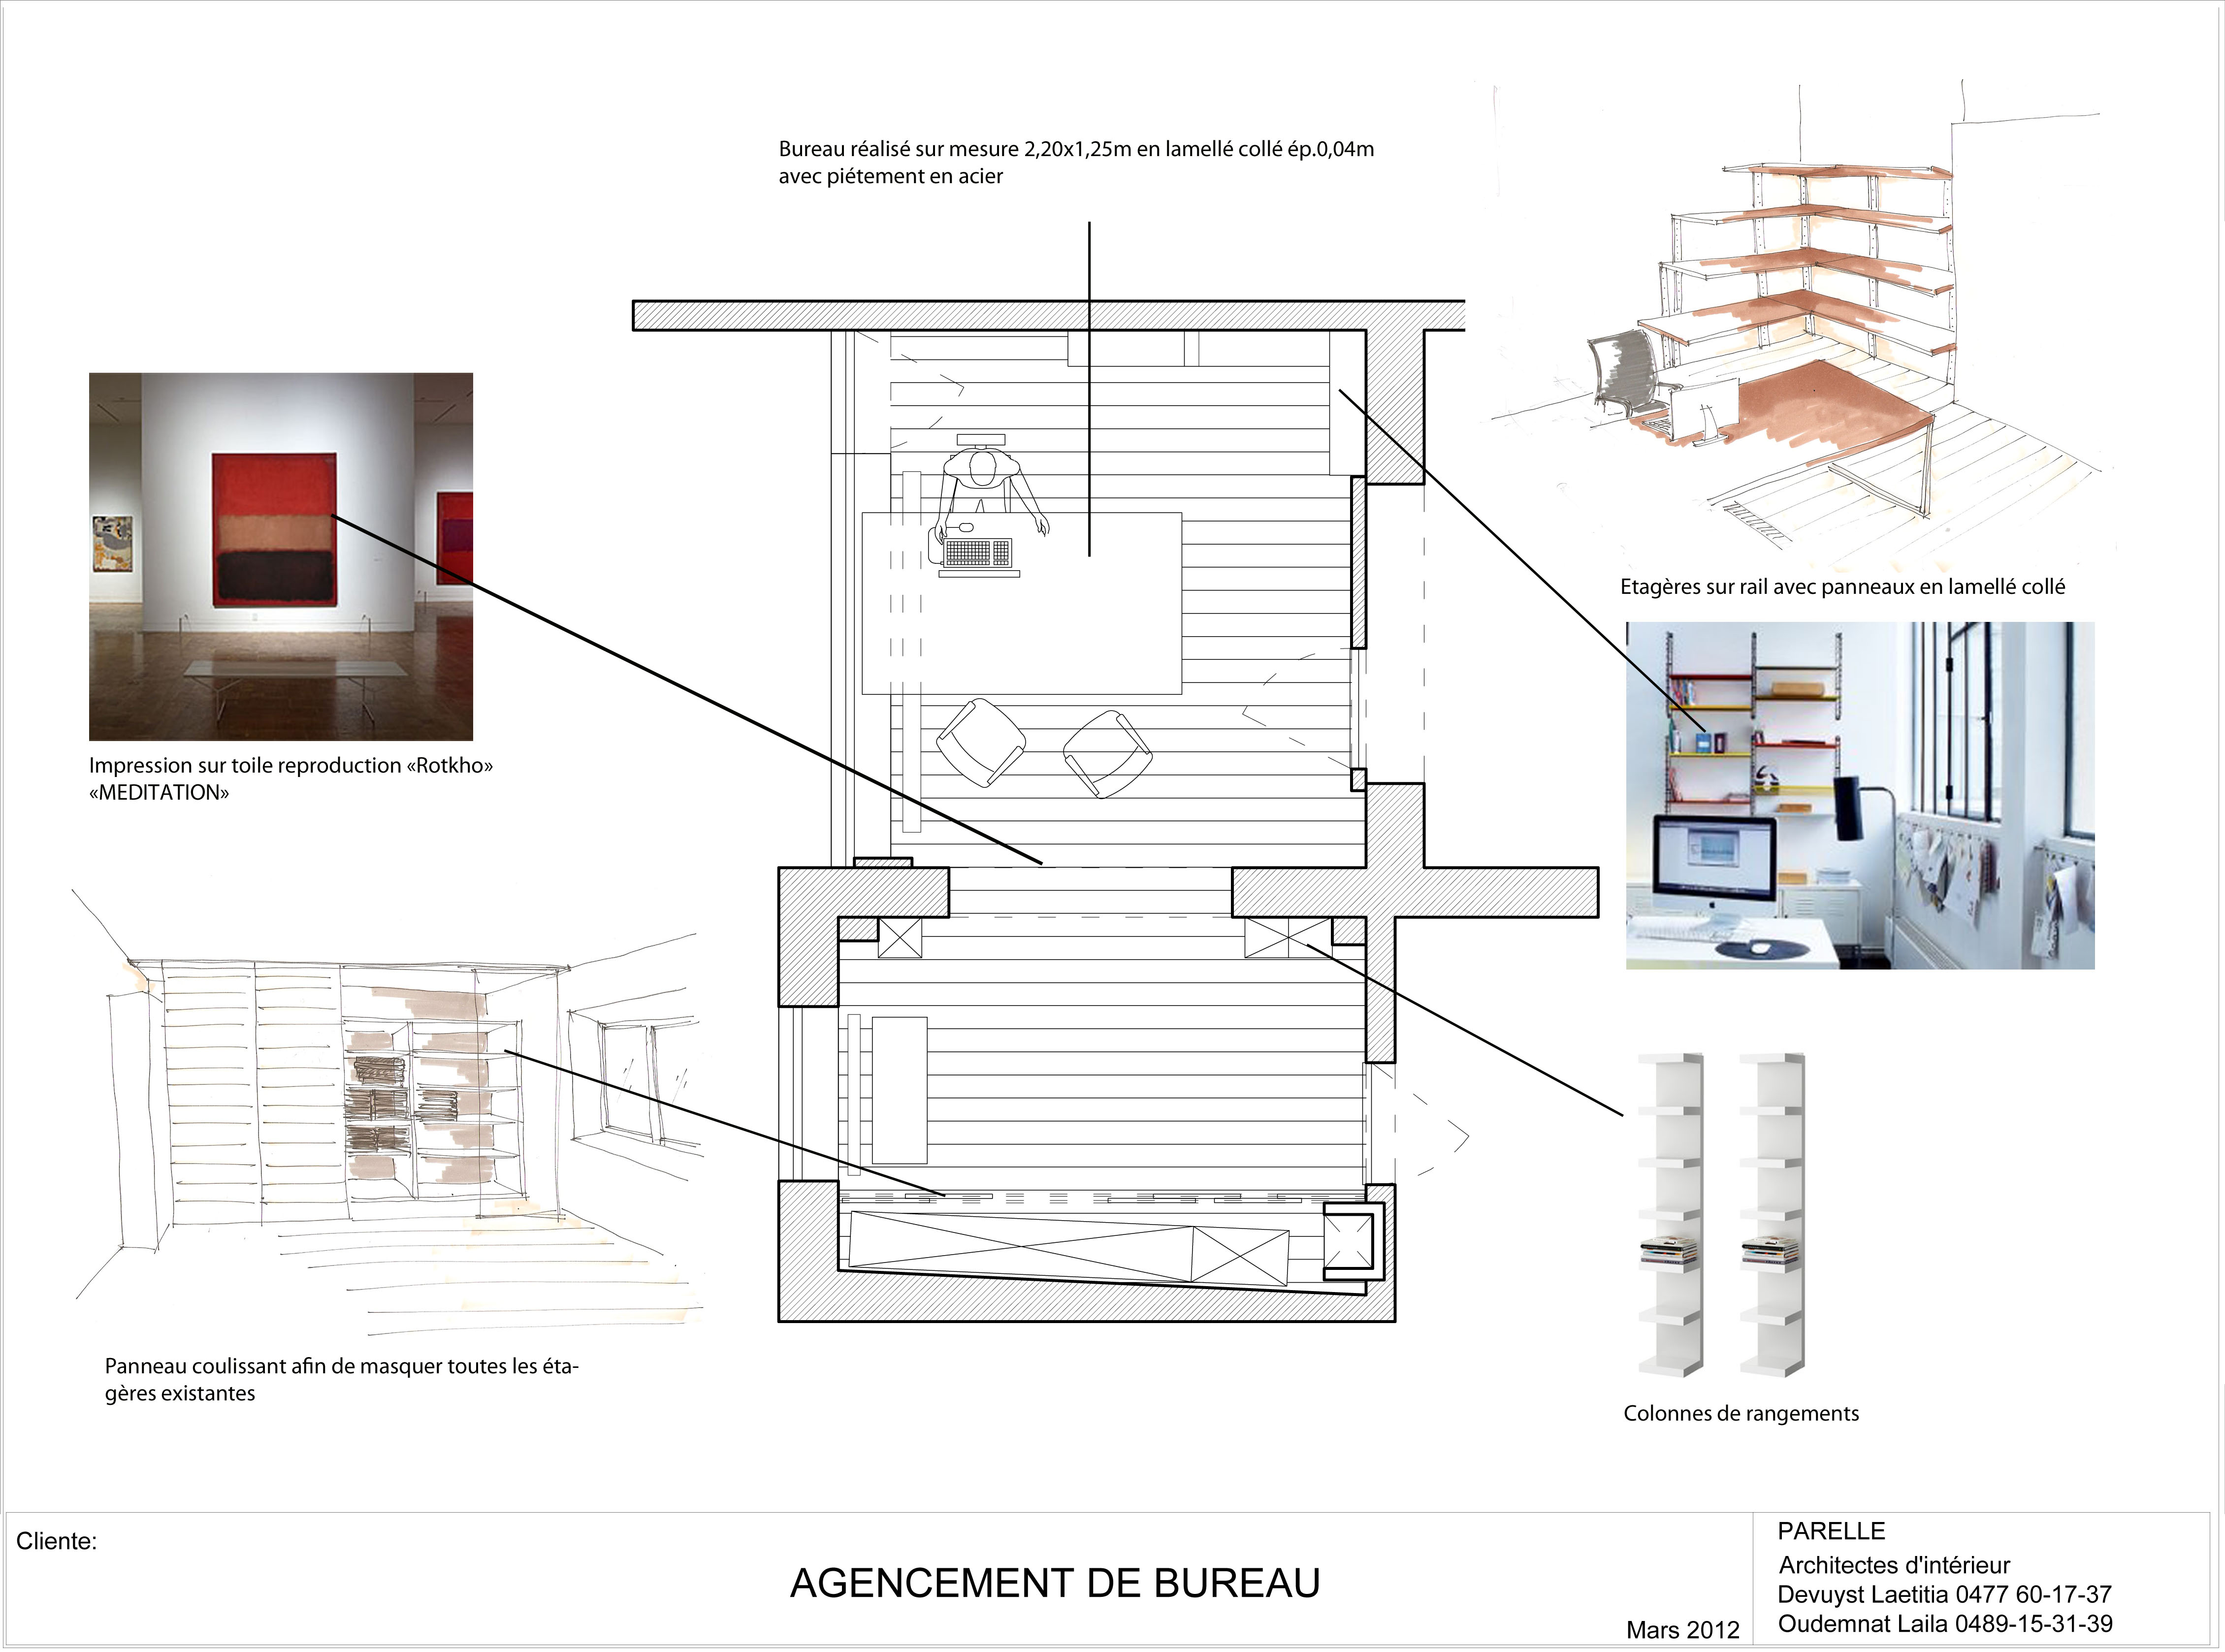 esquisses design parel. Black Bedroom Furniture Sets. Home Design Ideas